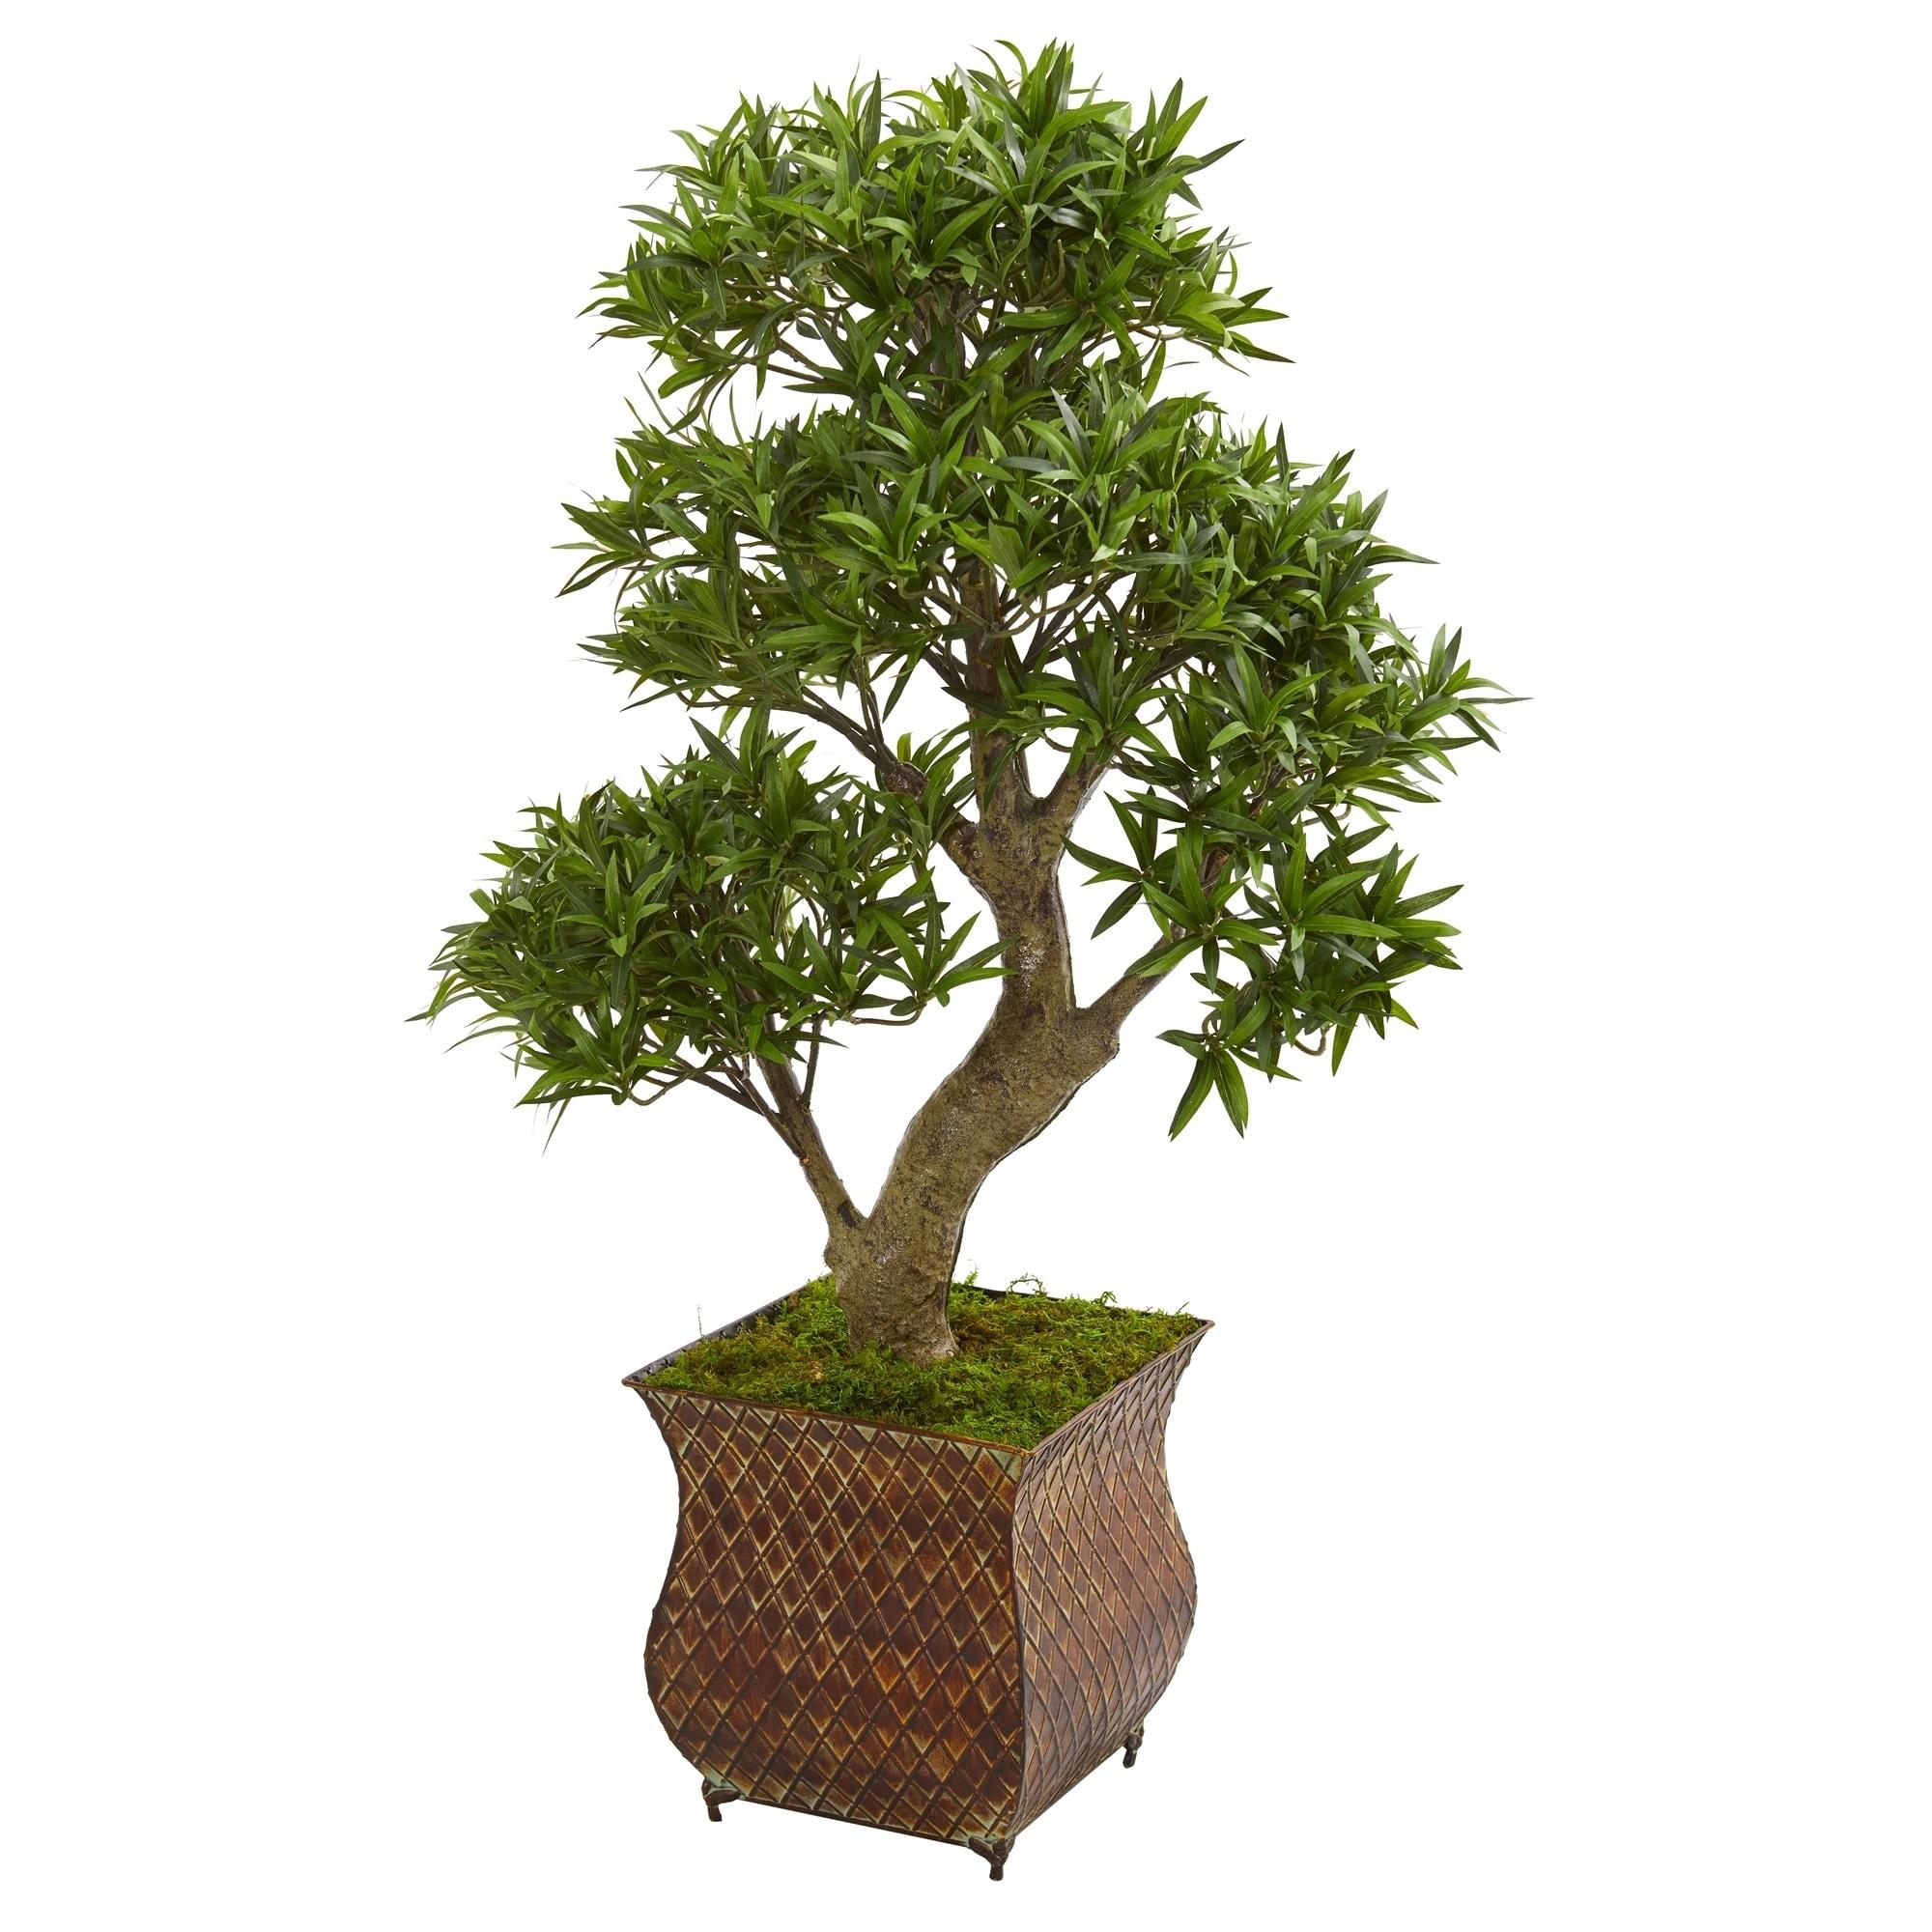 40 Podocarpus Artificial Bonsai Tree in Metal Planter